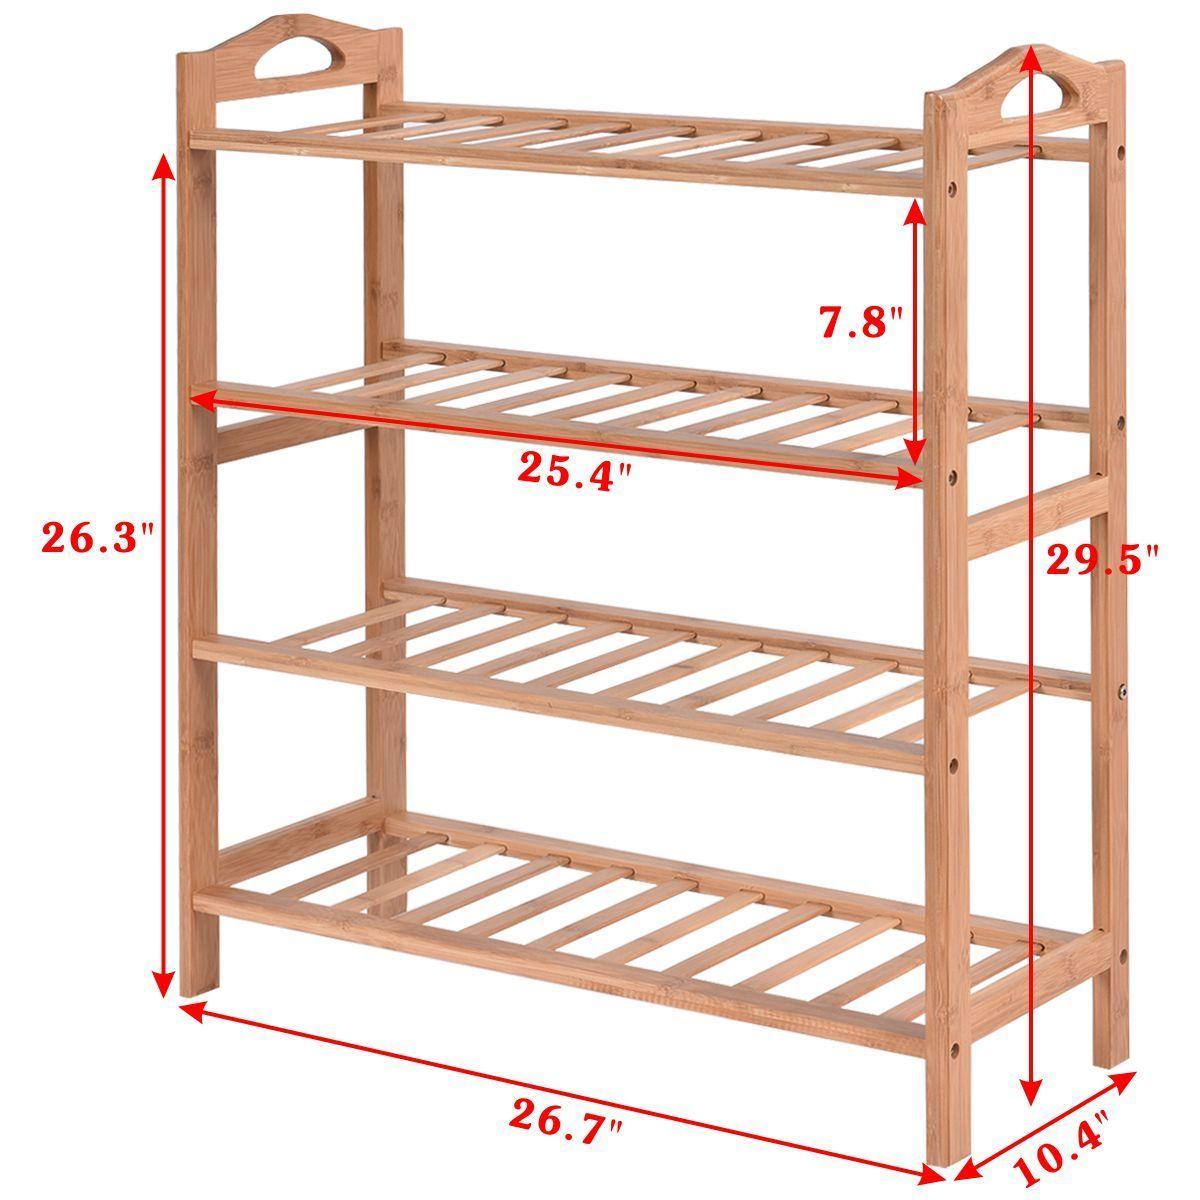 4-Tier Multi-Purpose Bamboo Shoe Rack Shelf Storage Organizer Cabinet Bathroom